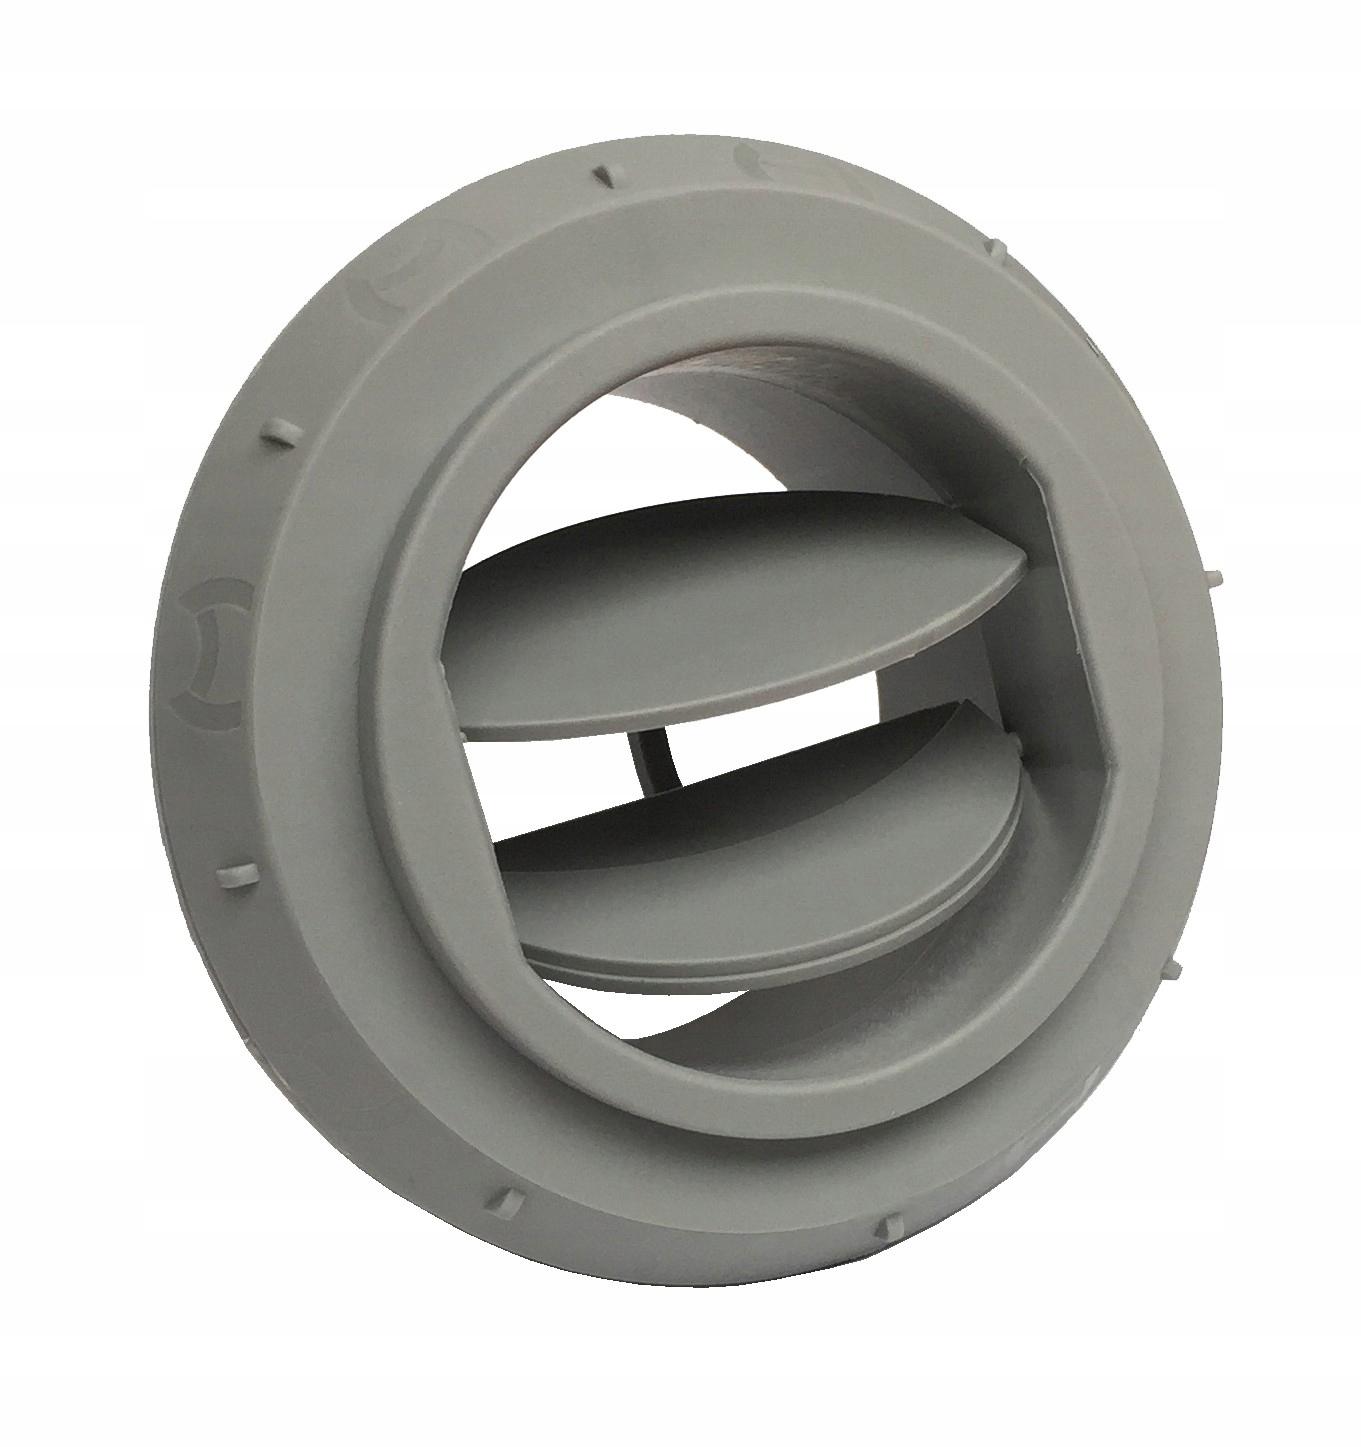 выход воздуха fi 60mm webasto серый - 1320937a